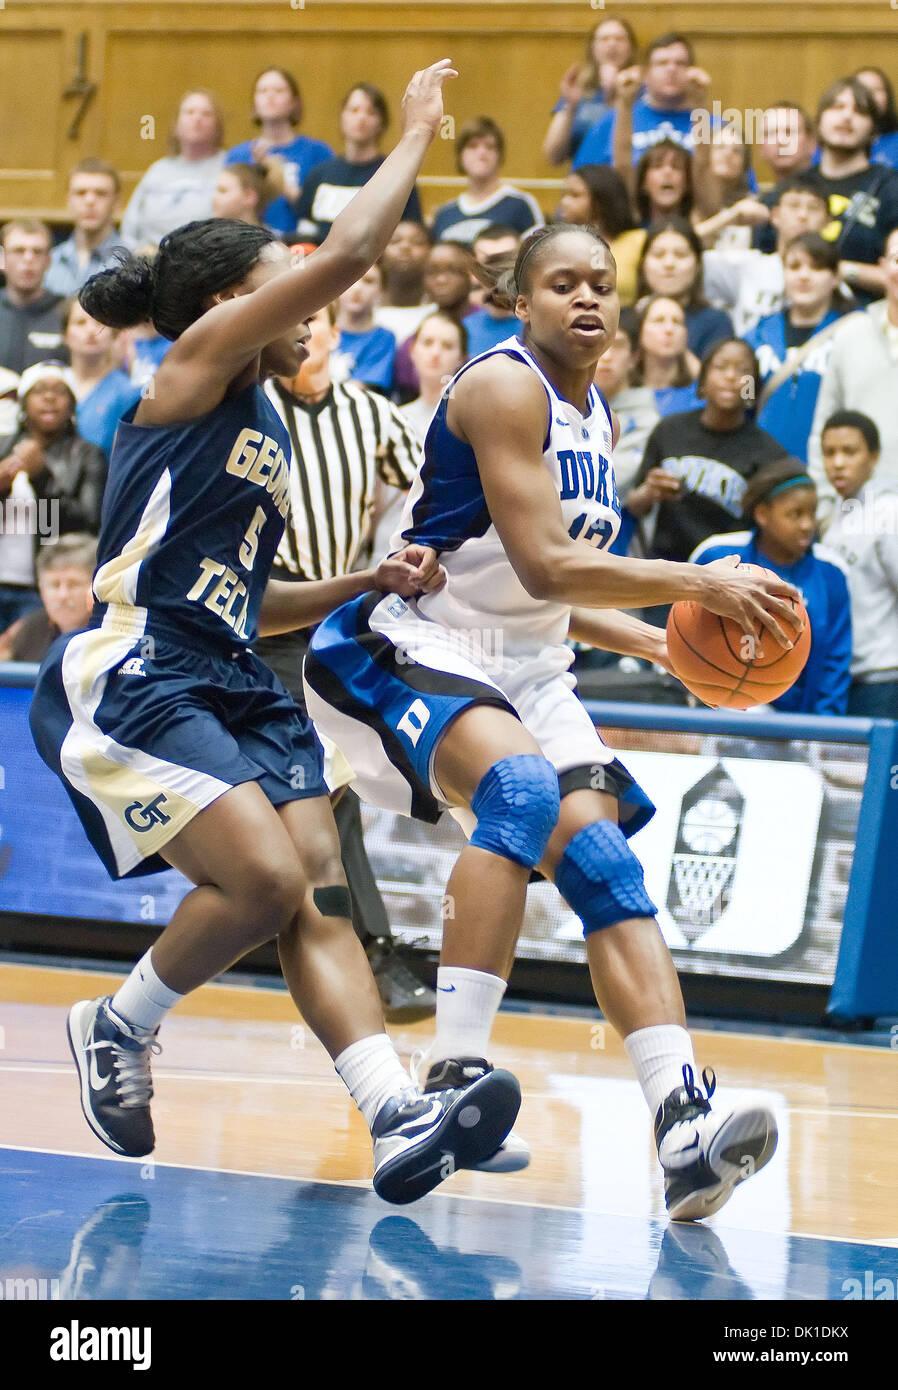 Jan. 21, 2011 - Durham, North Carolina, U.S - Duke guard/forward ...